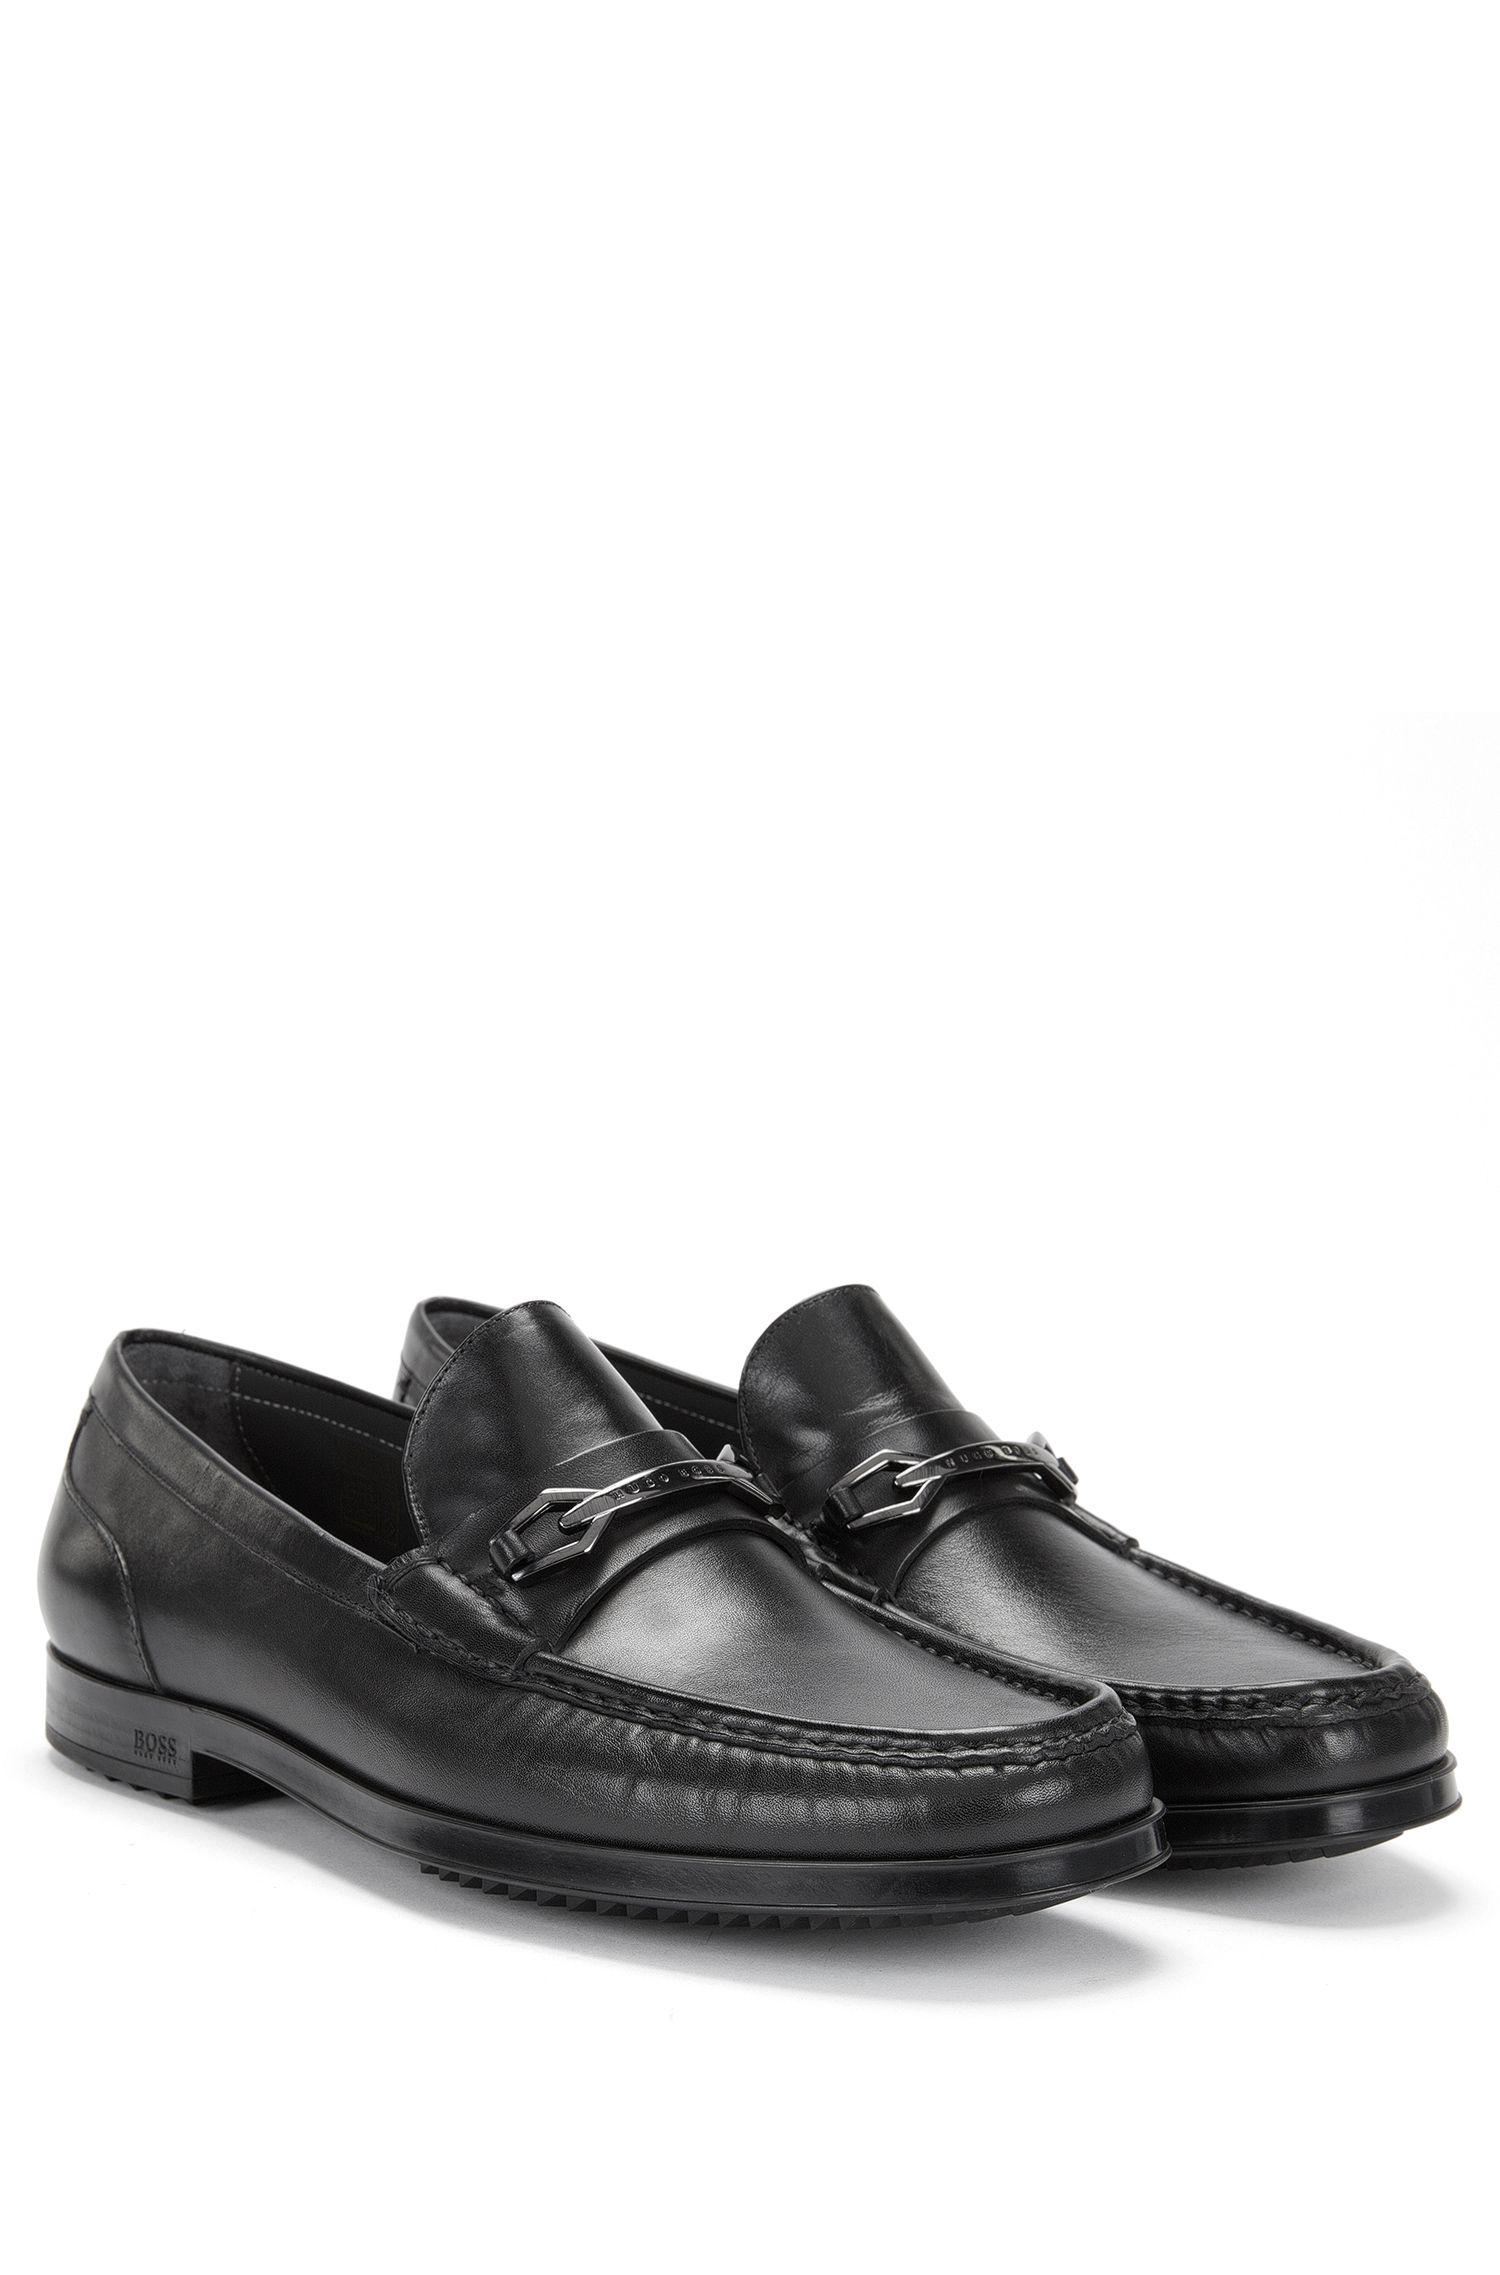 Mokassins aus glattem Leder mit flachem Absatz: 'Clamoc', Schwarz